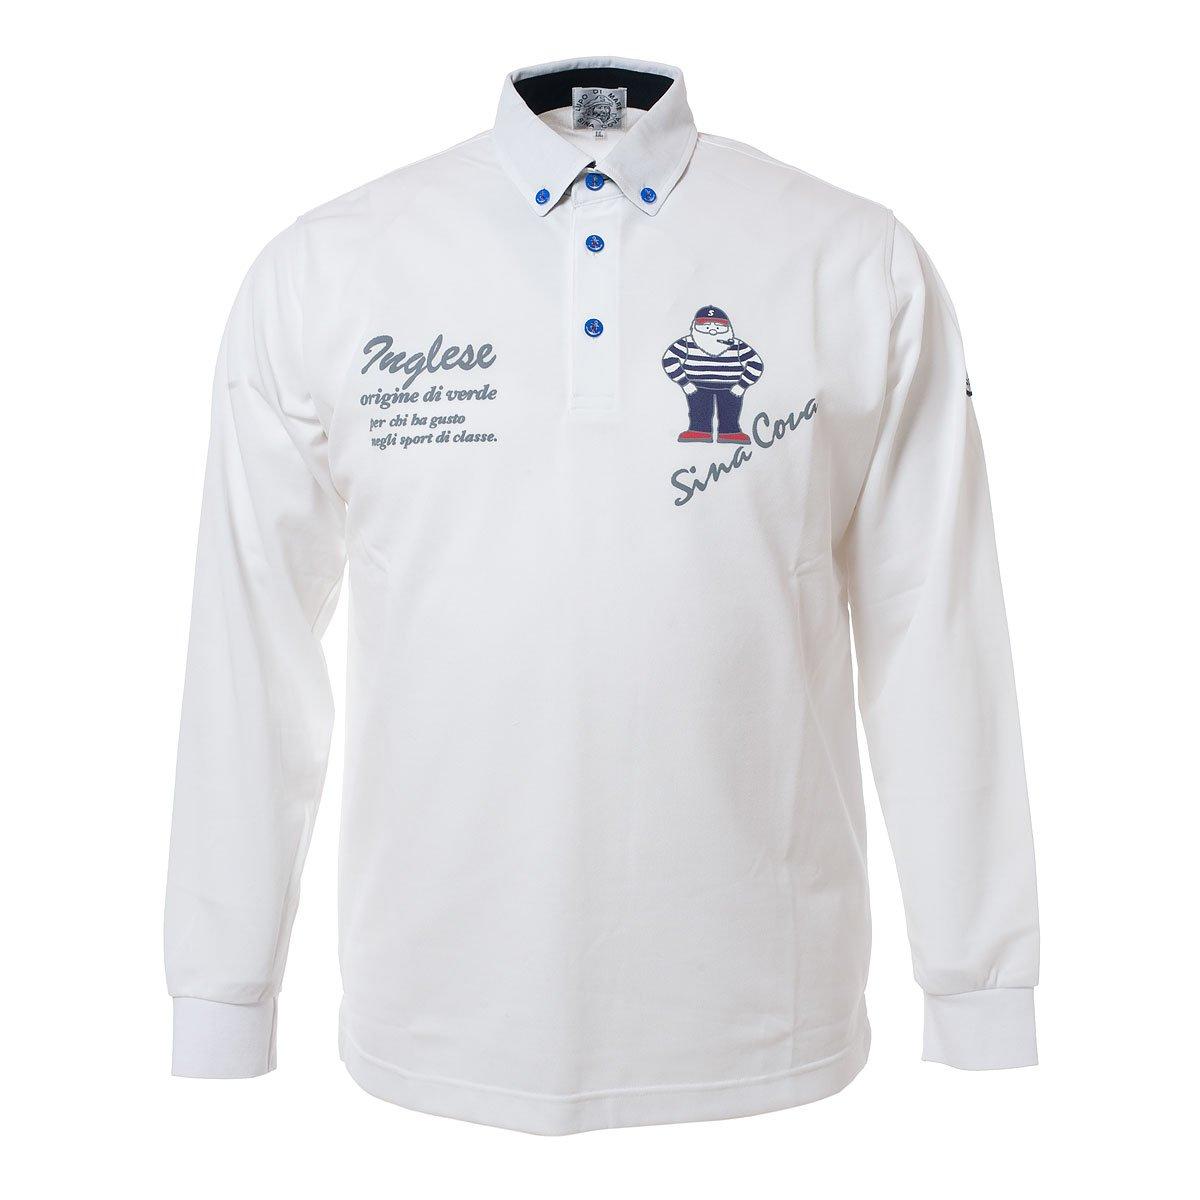 SINACOVA Men's long sleeve polo shirt White Medium by SINA COVA